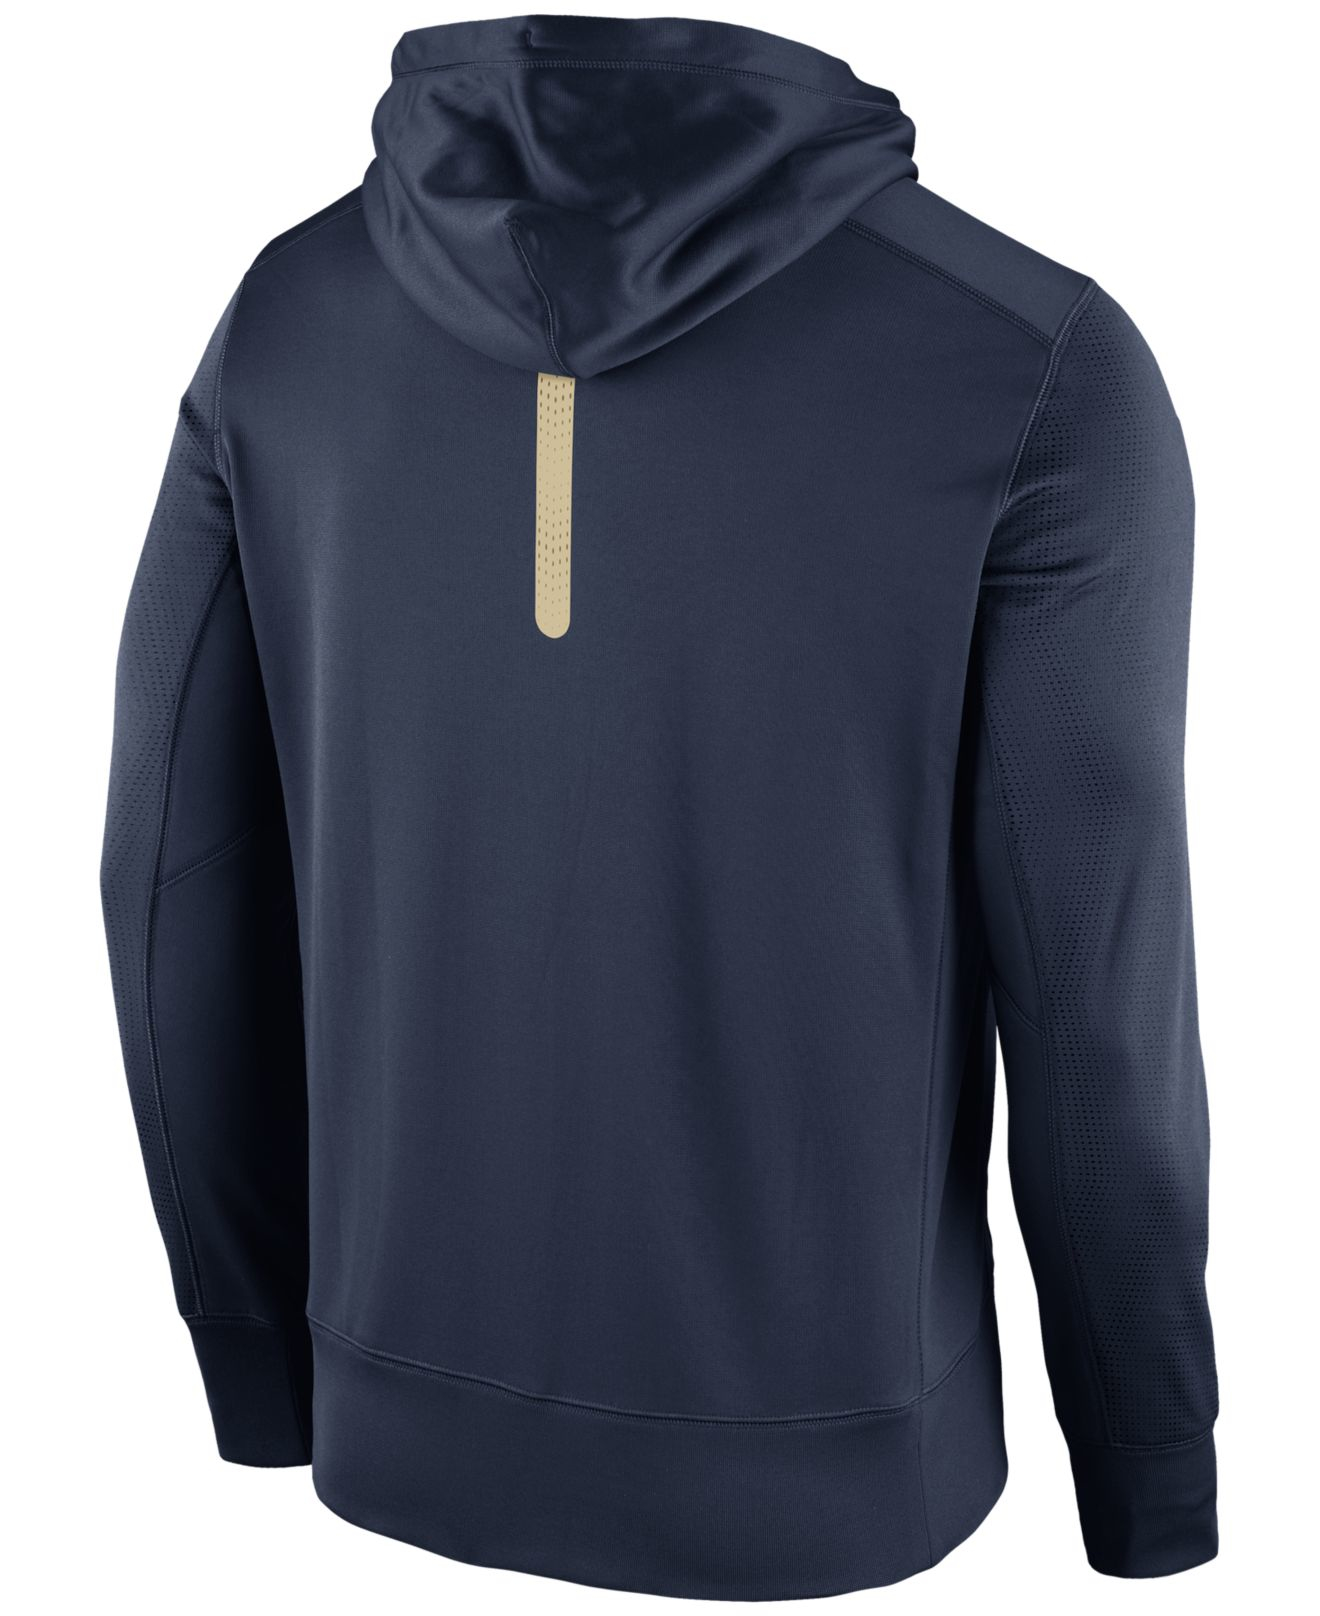 Pitt panthers hoodie